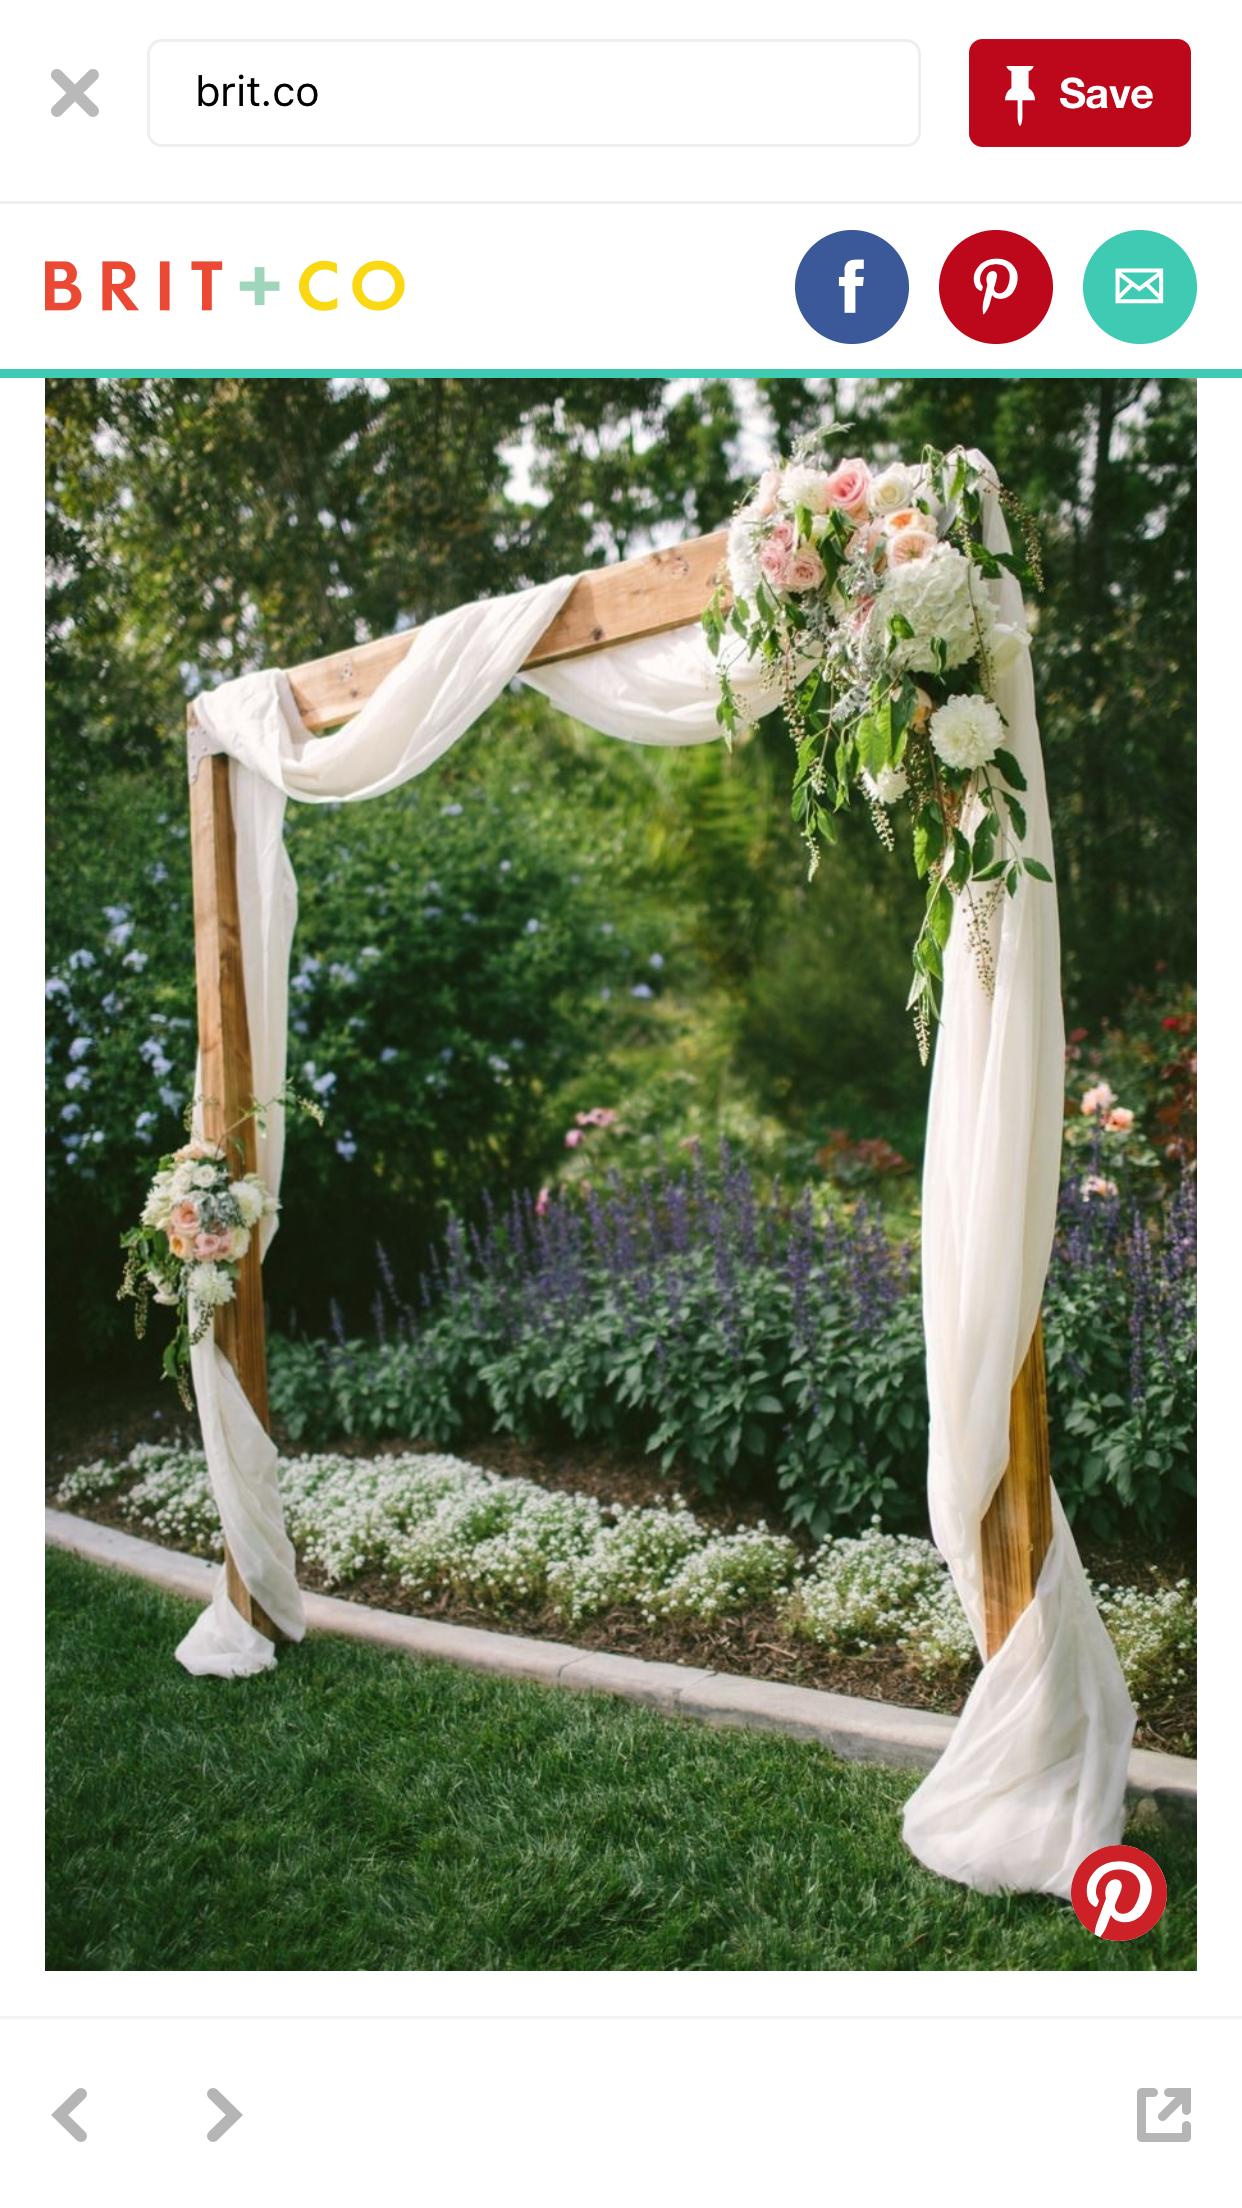 Full hd diy wedding arbor of desktop pin by emma aumiller on dream